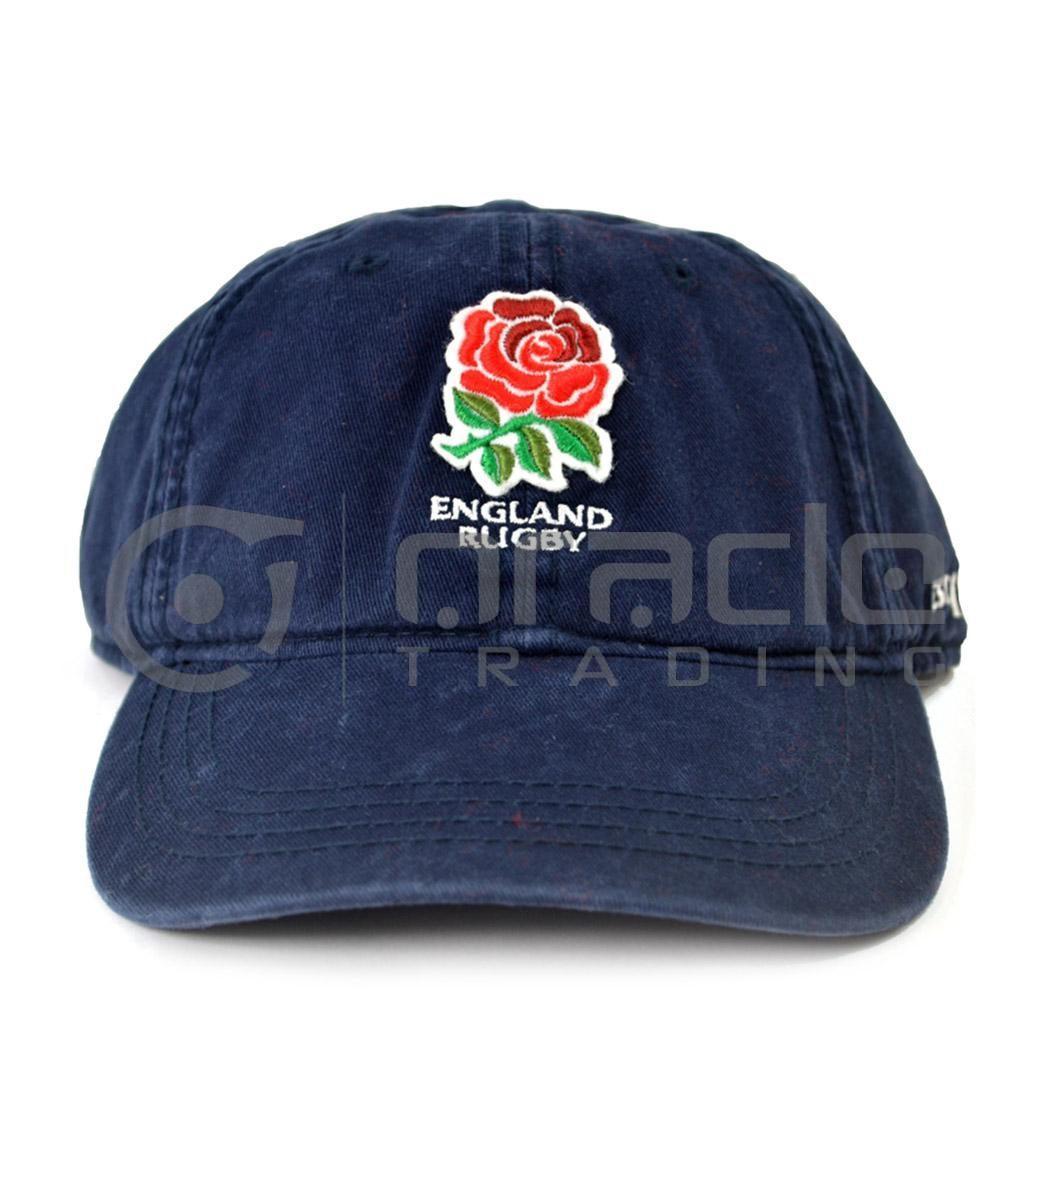 England Rugby Crest Hat (Navy)